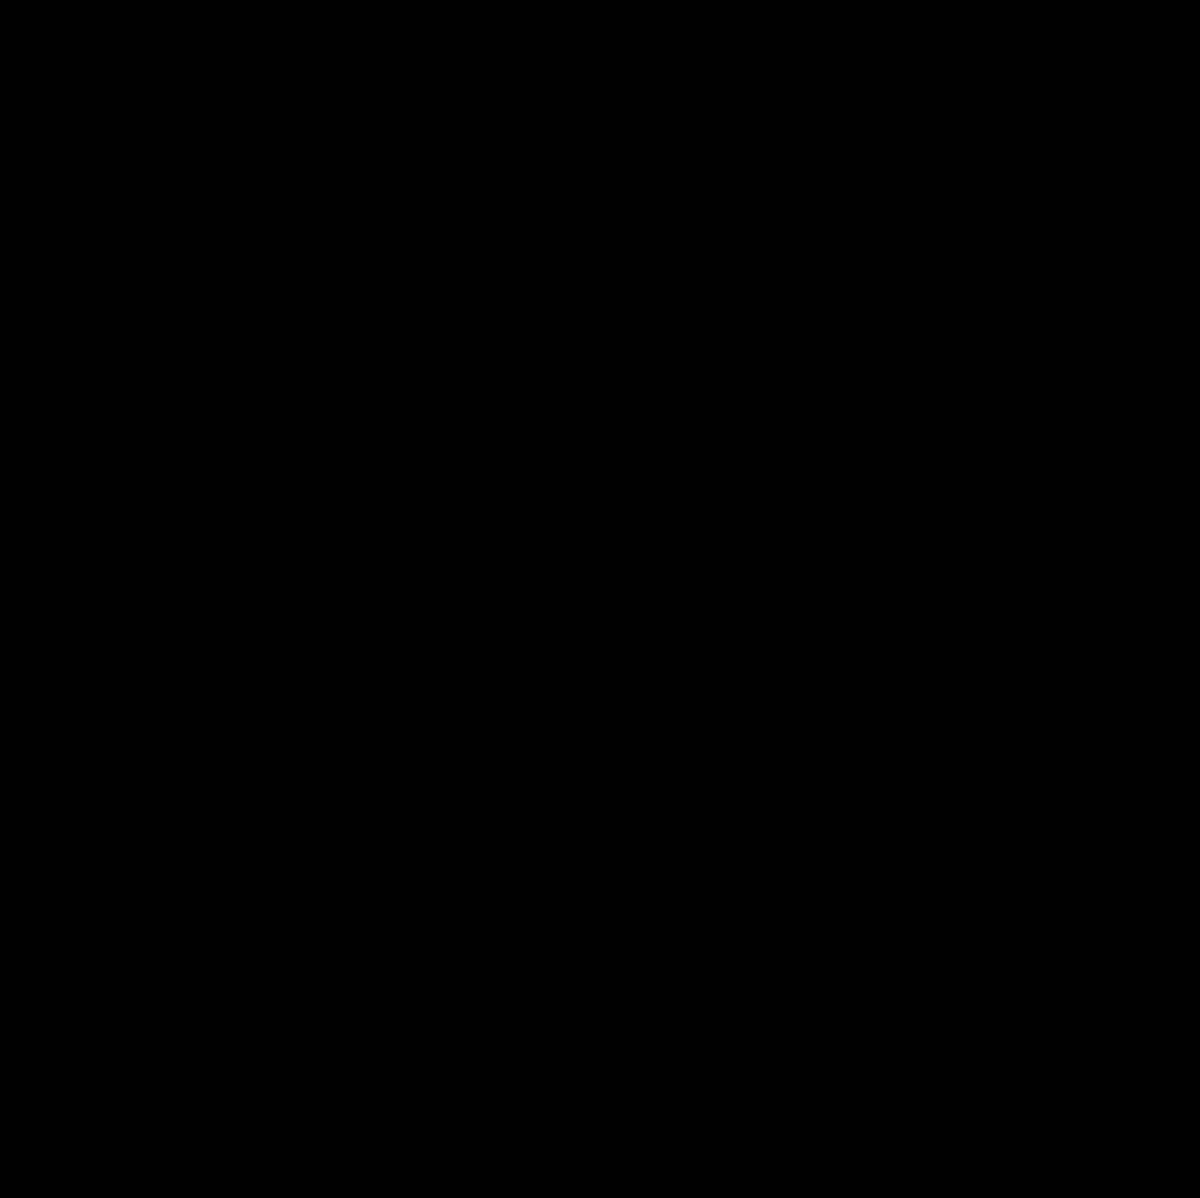 N.G.M.R- светещо лого- черна раница